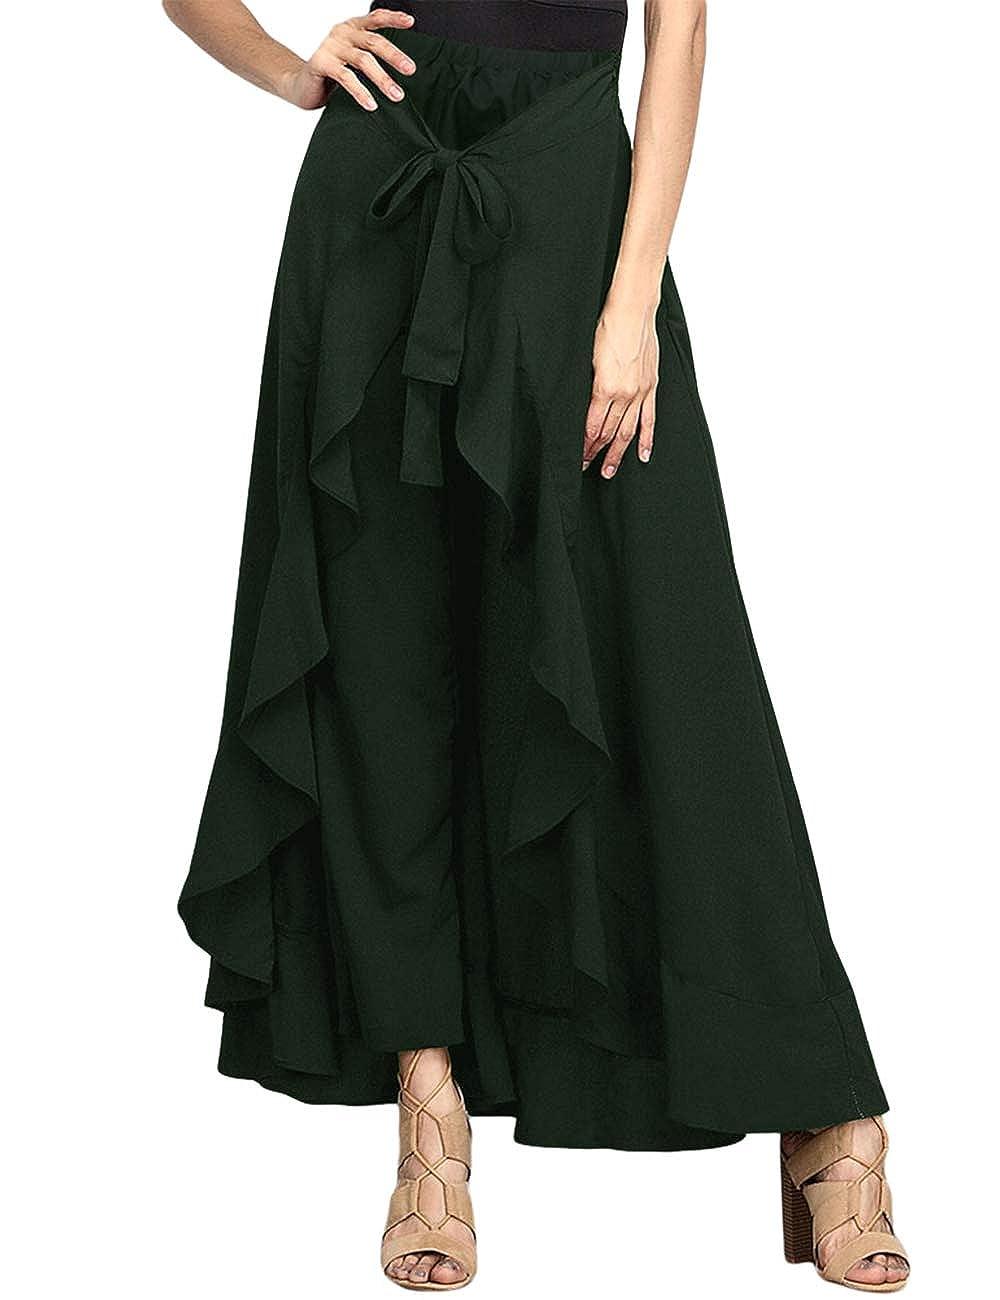 SEBOWEL Women's Ruffle Plain Wide Leg Split Tie-Waist Maxi Long Palazzo Overlay Pant Skirts